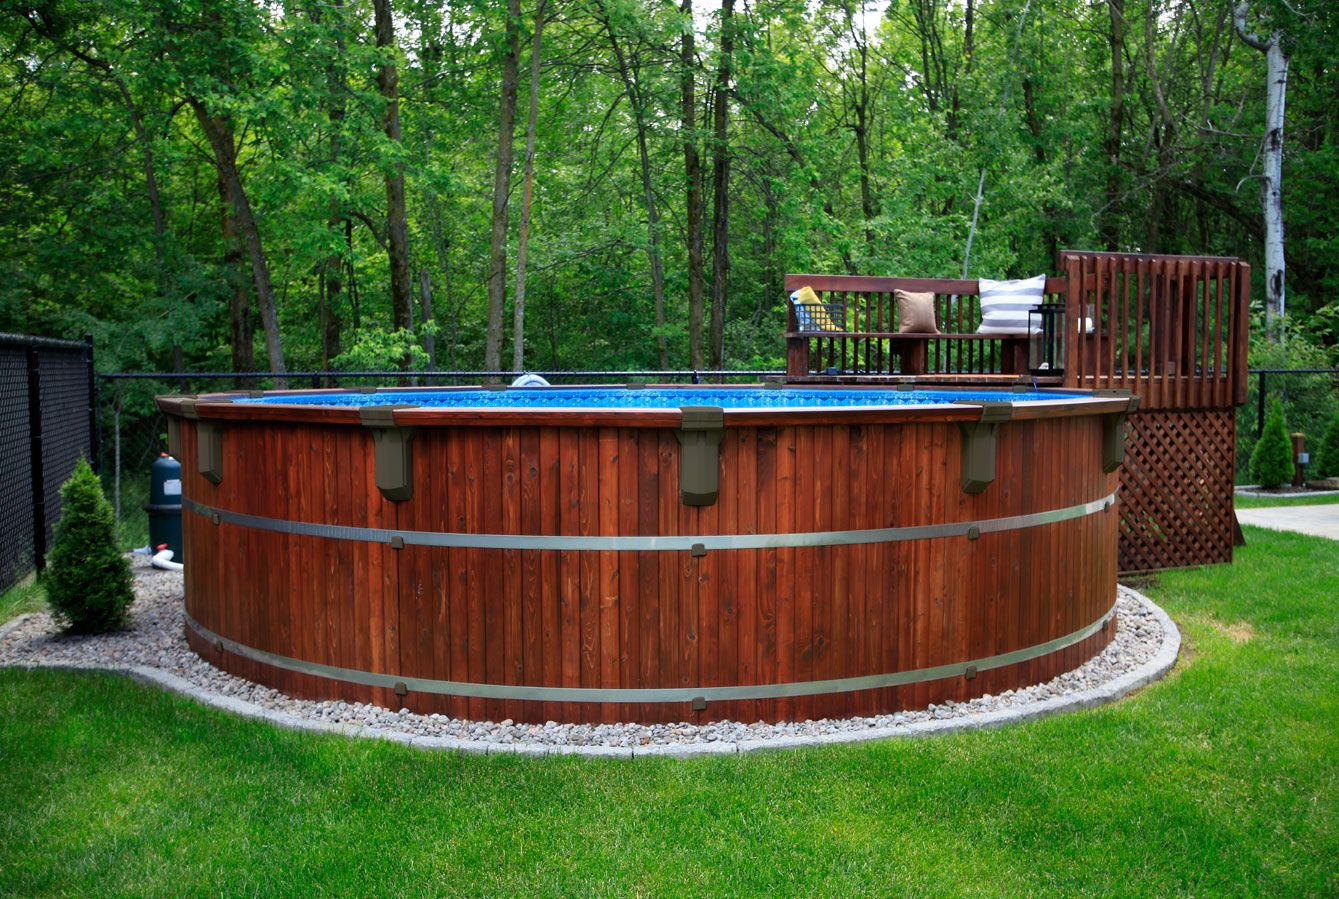 Idee Amenagement Tour De Piscine piscine en cèdre hors terre   patio piscine   aménagement